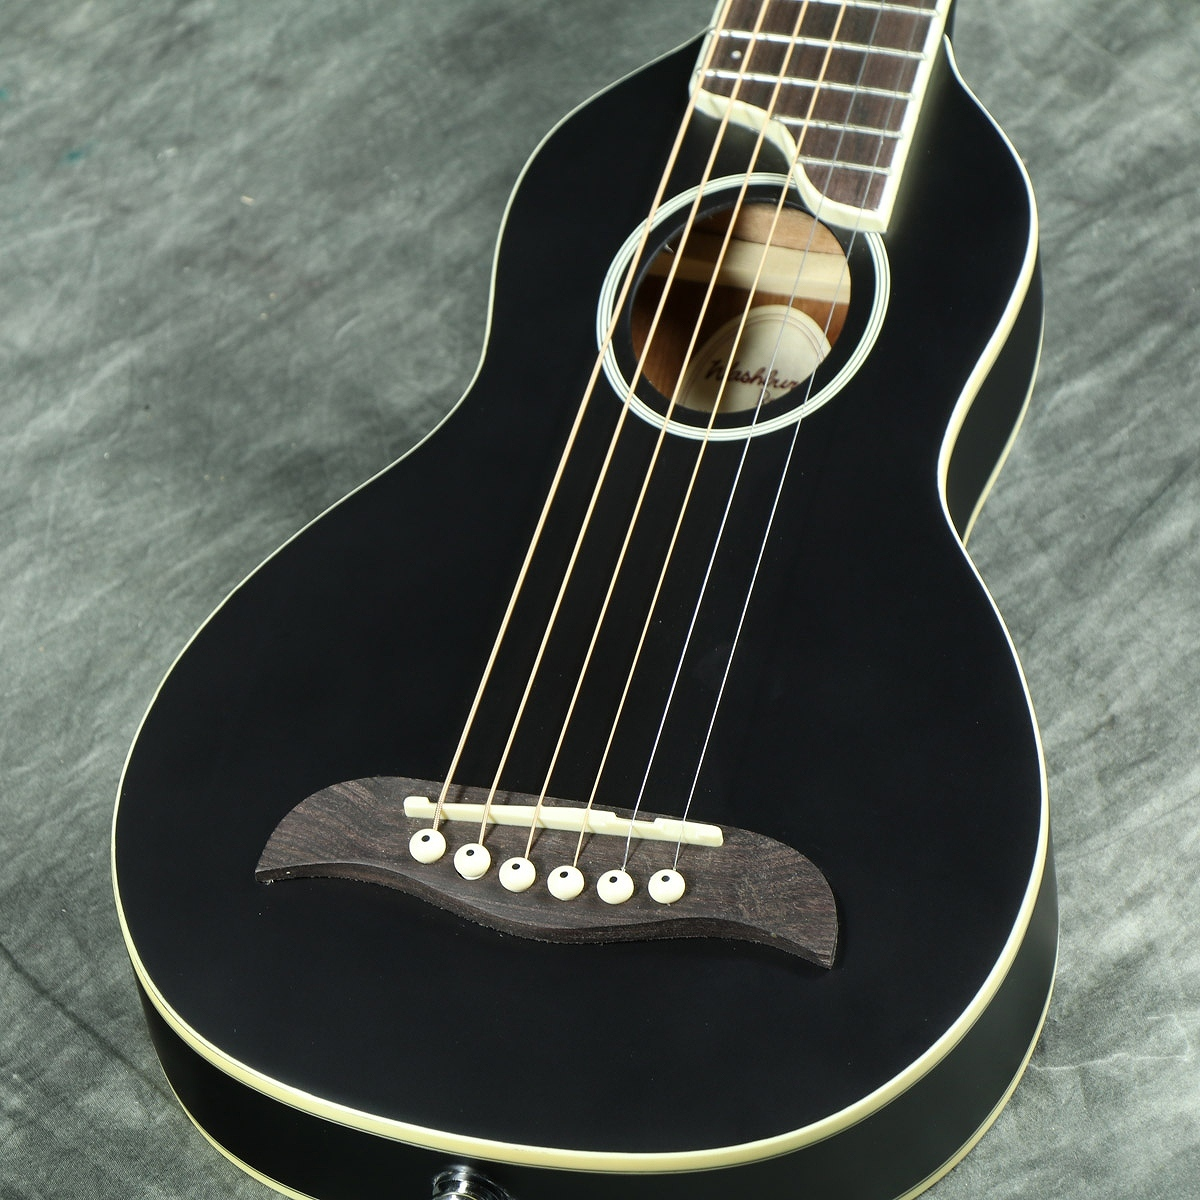 Washburn RO10SBK (ブラック) トラベルギター【WEBSHOP】